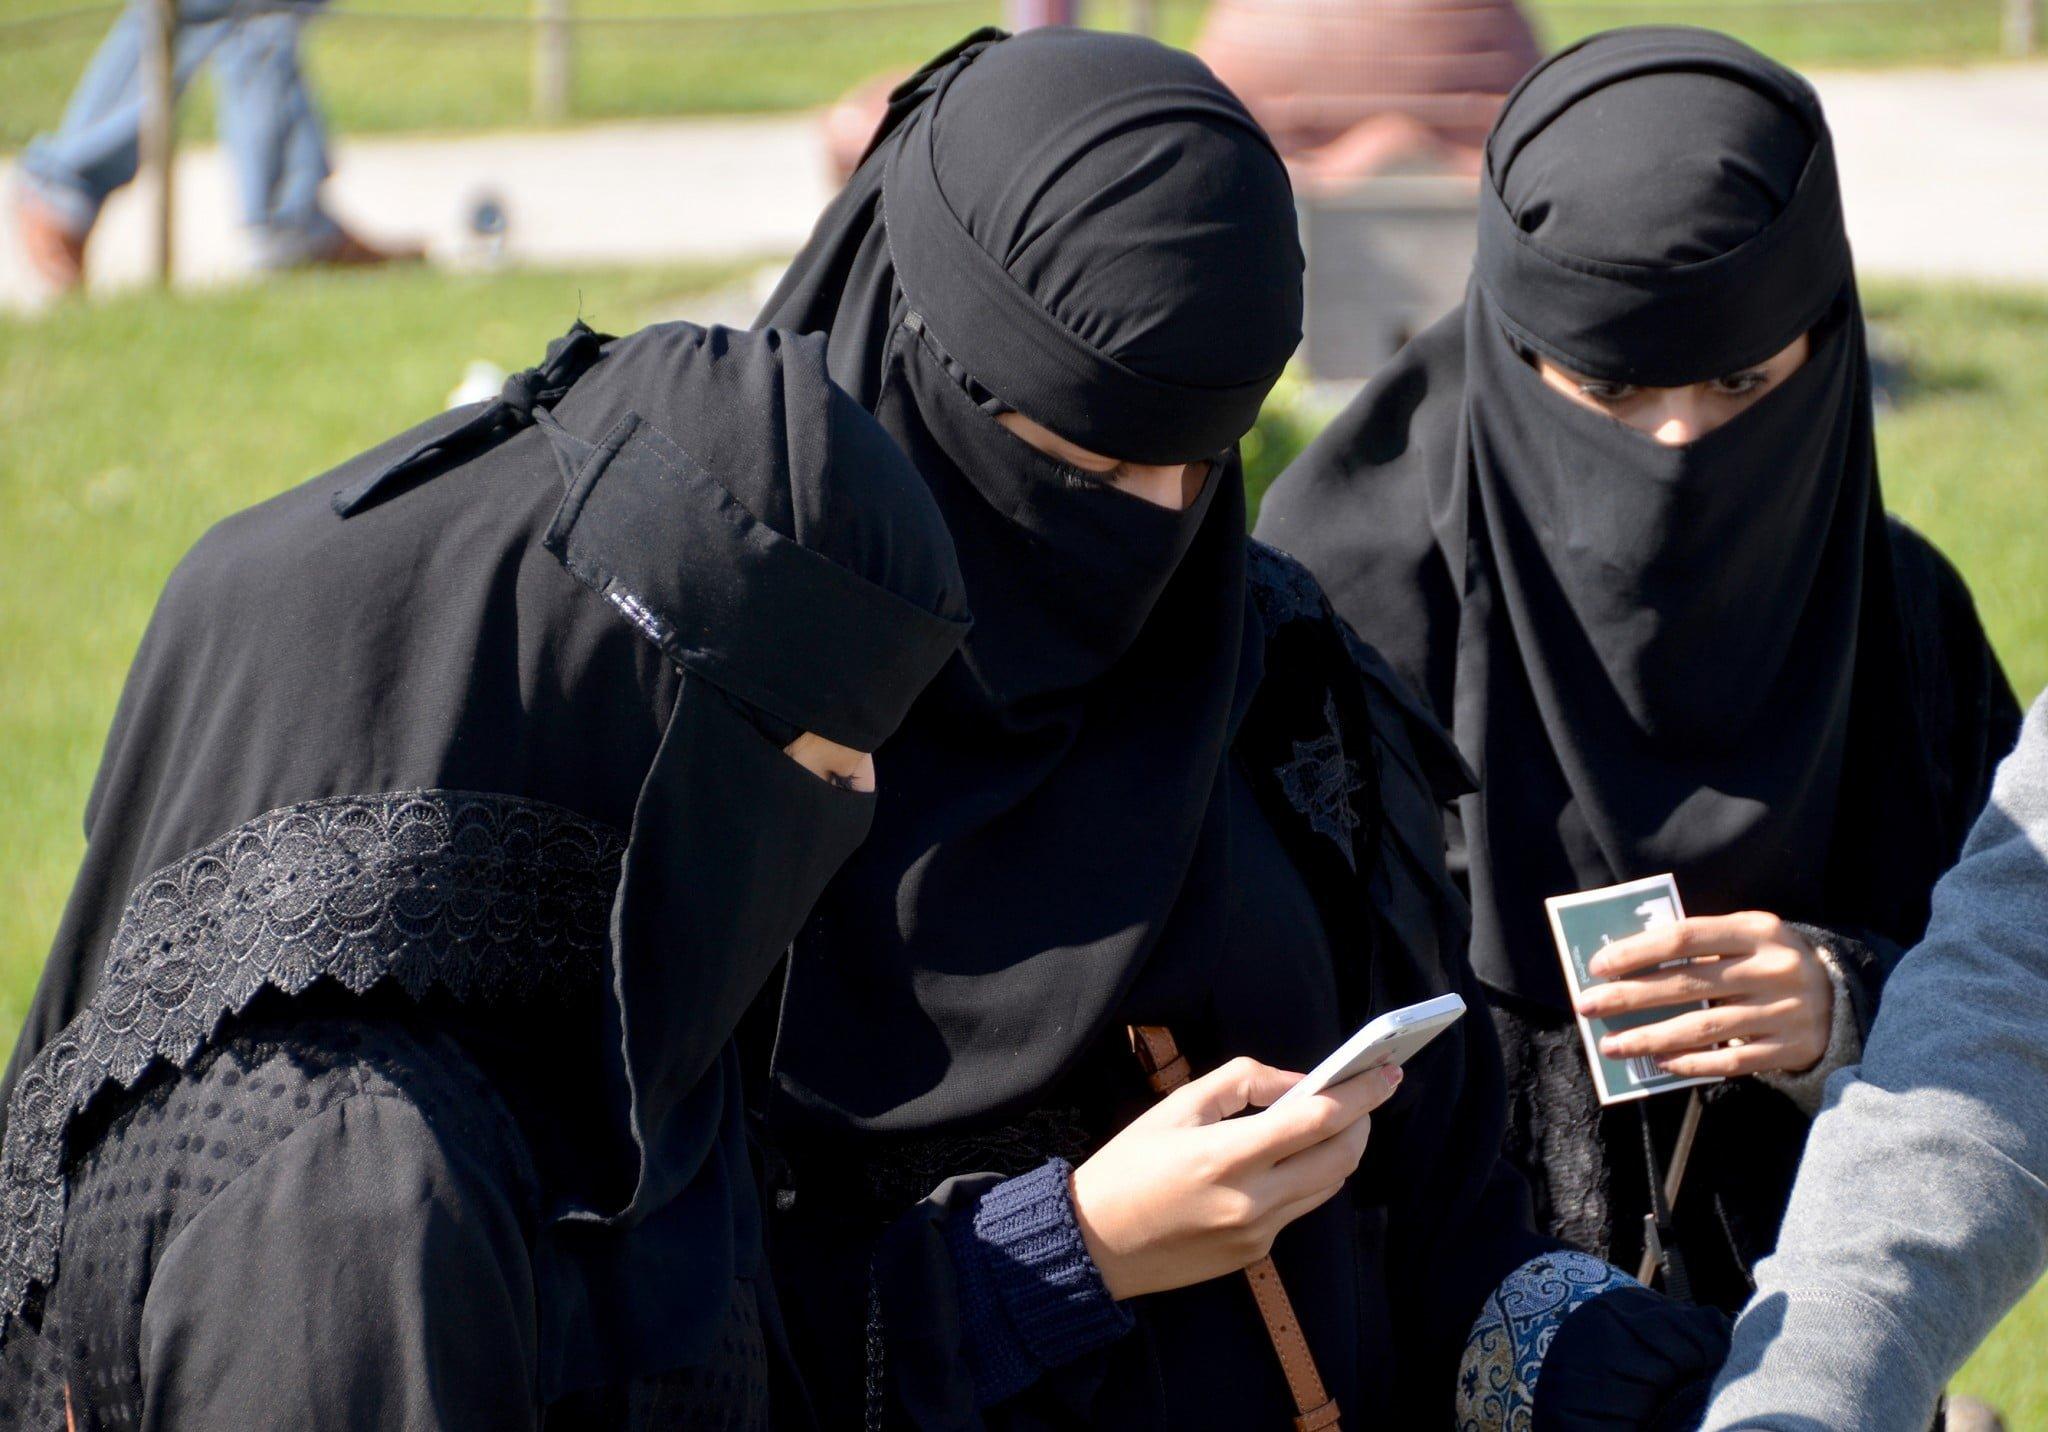 Bbw arab women from yemen - 1 part 5